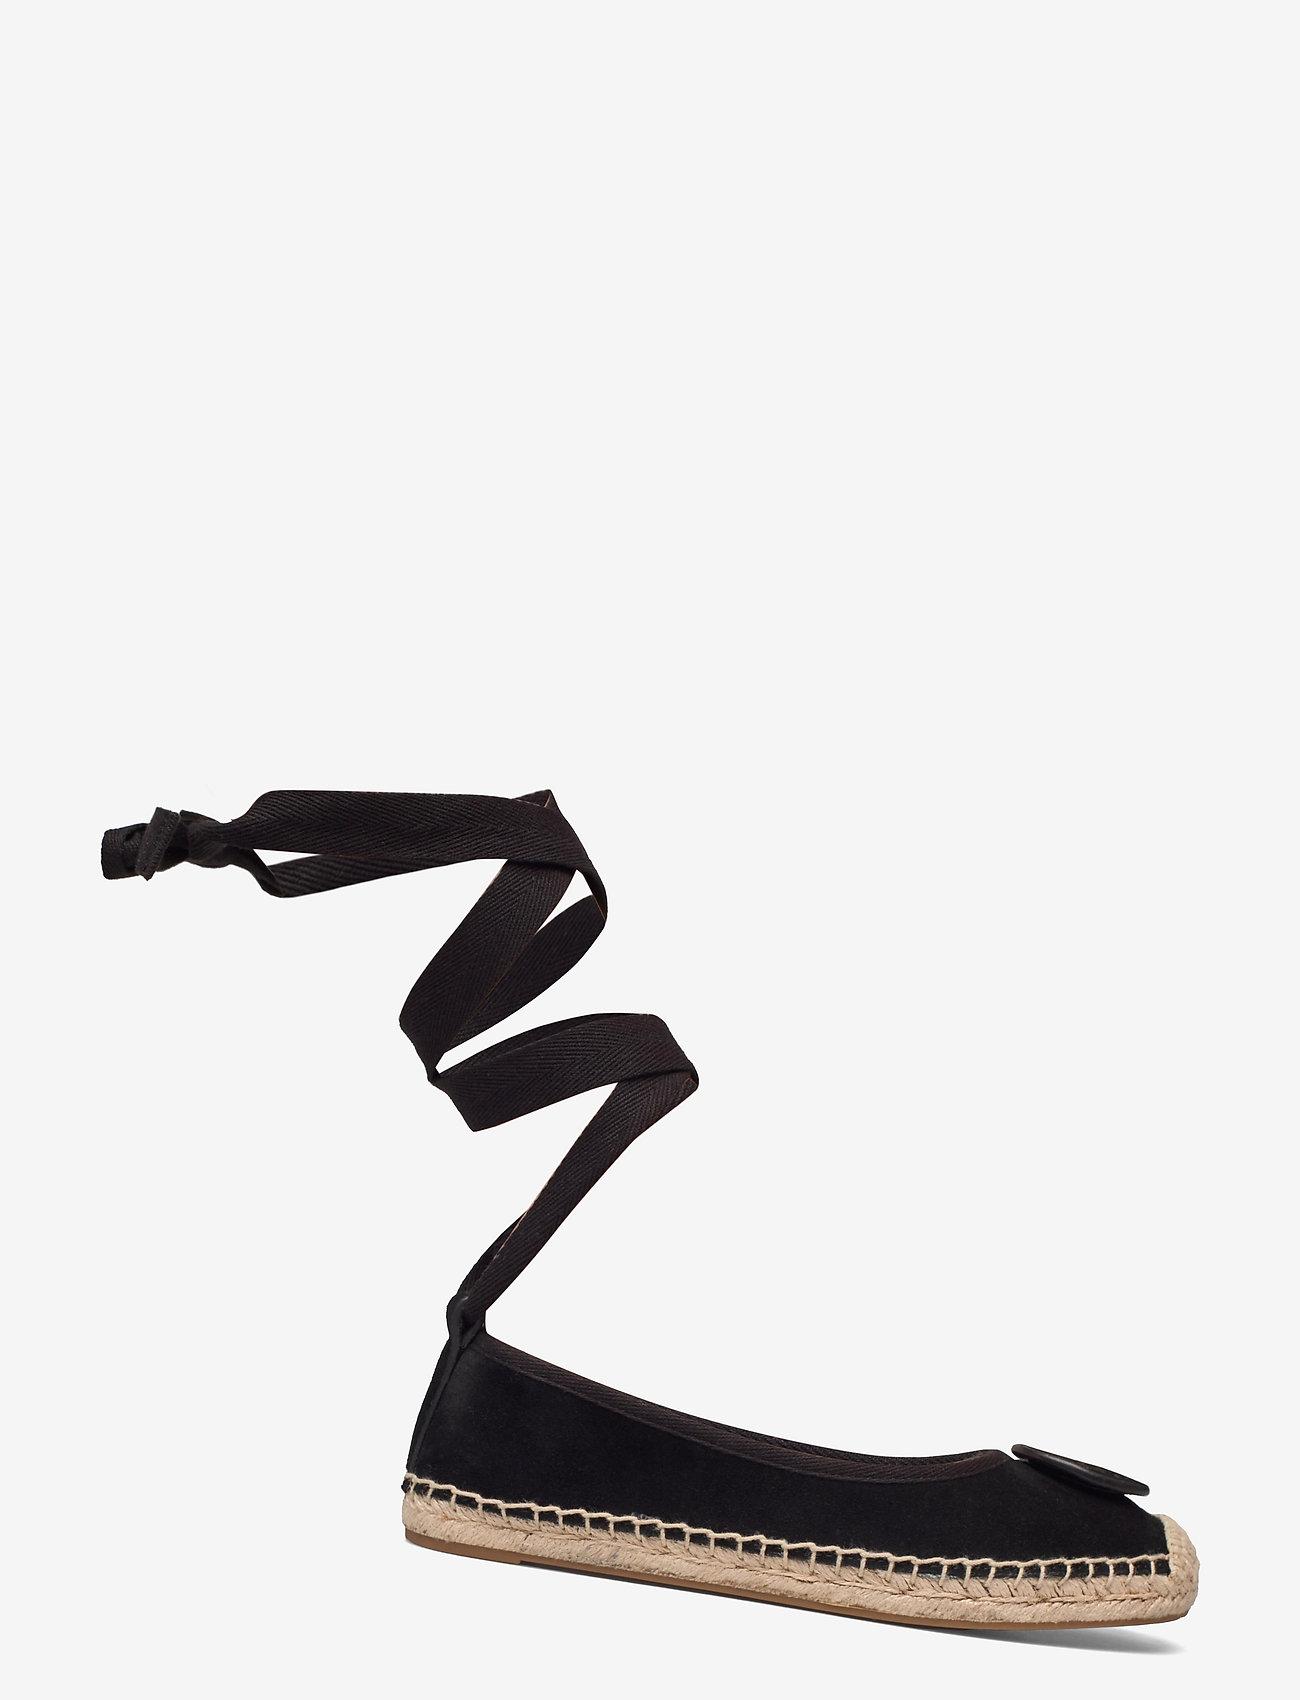 Tory Burch - MINNIE BALLET ESPADRILLE - flade espadrillos - perfect black - 1